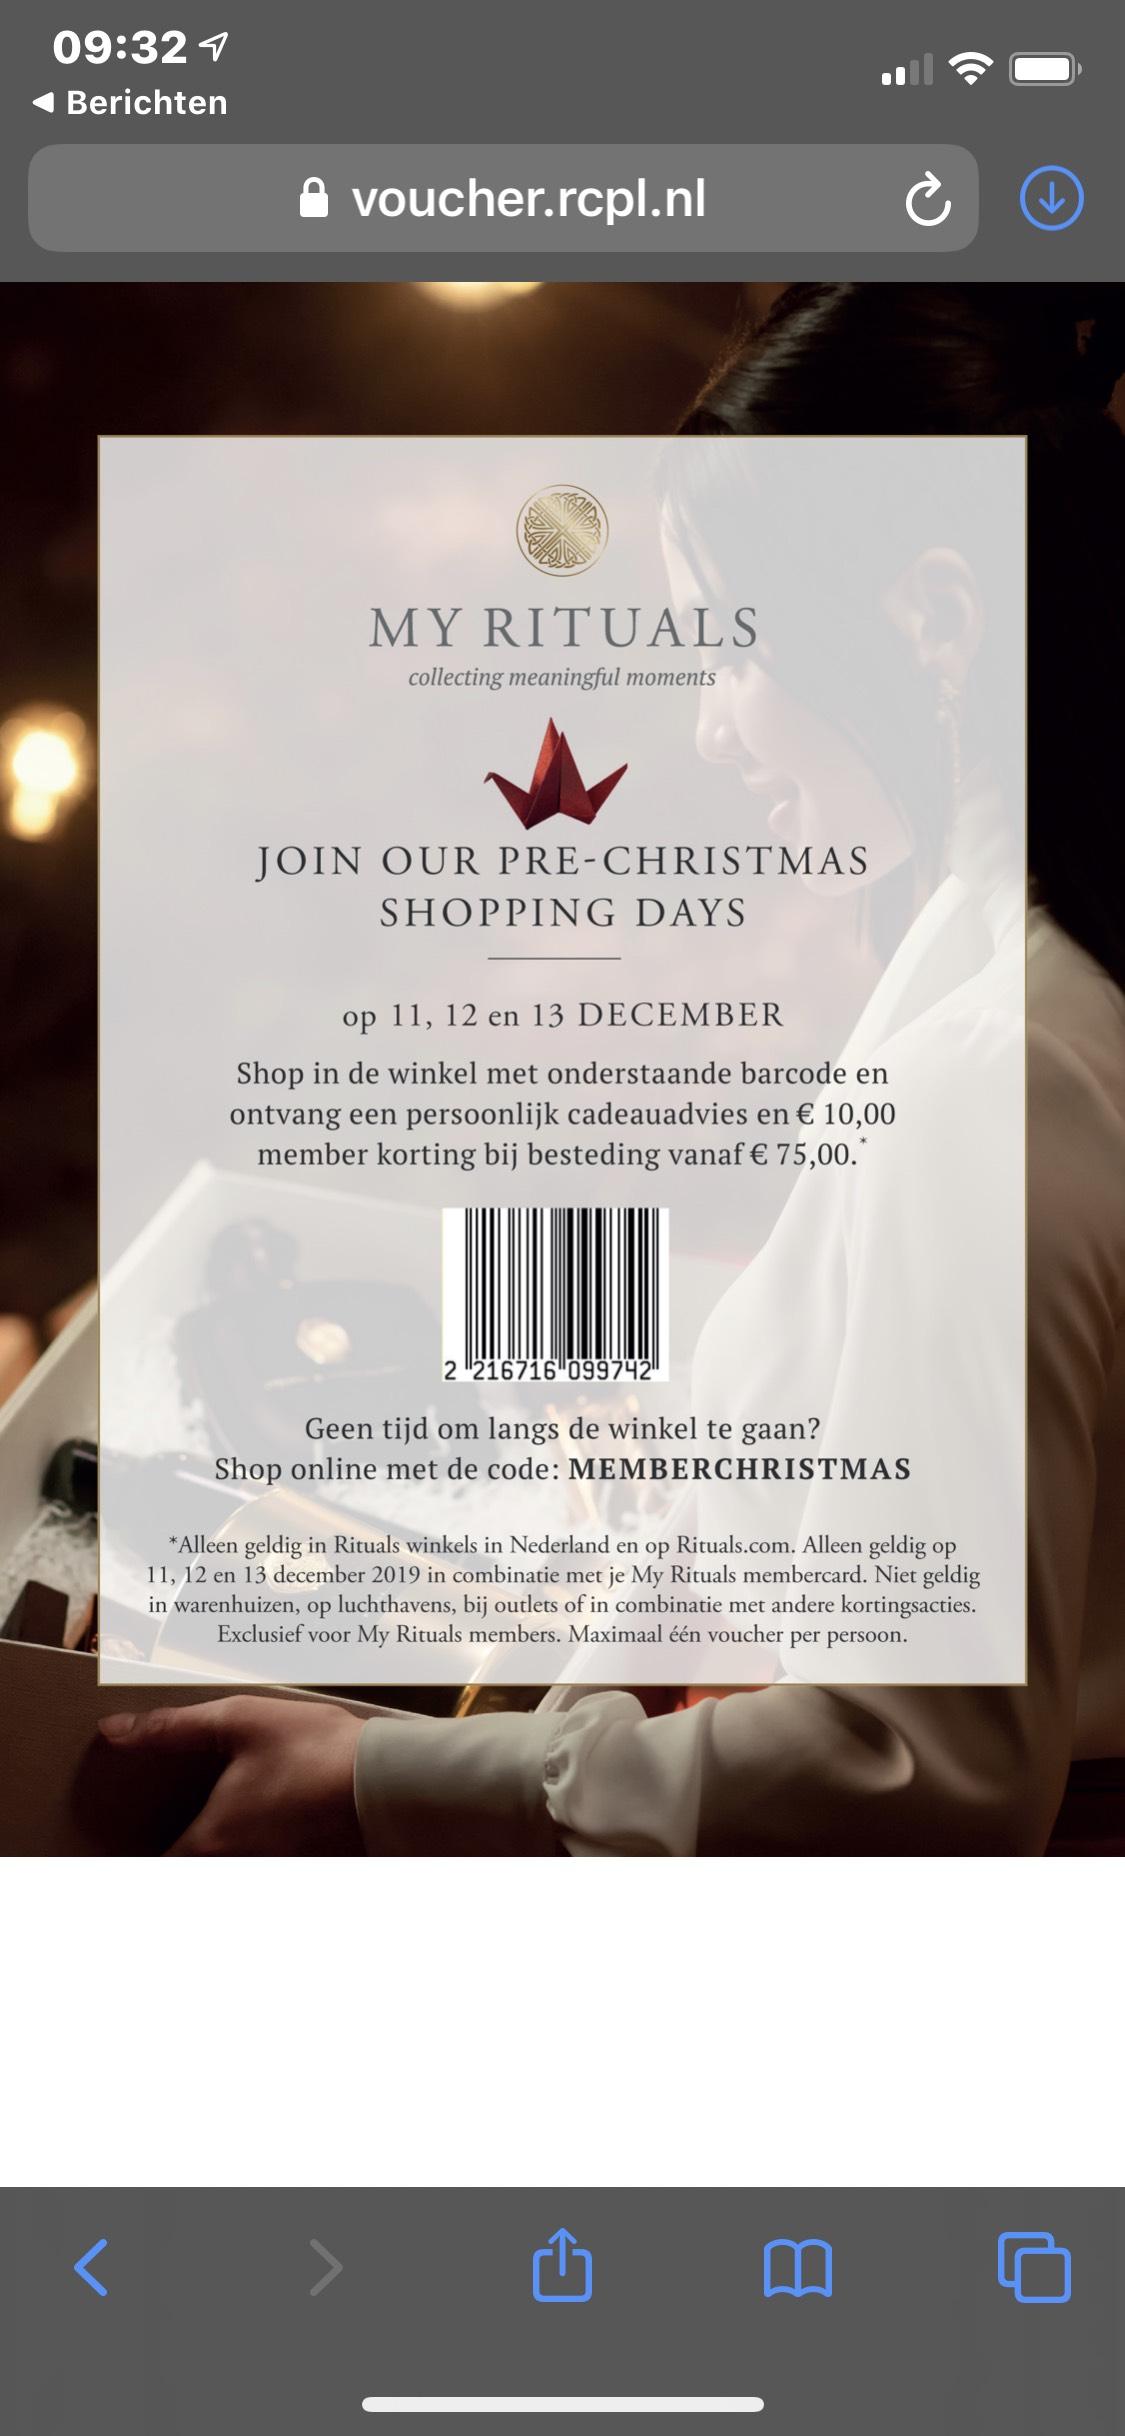 10 euro korting vanaf 75 euro !! Rituals